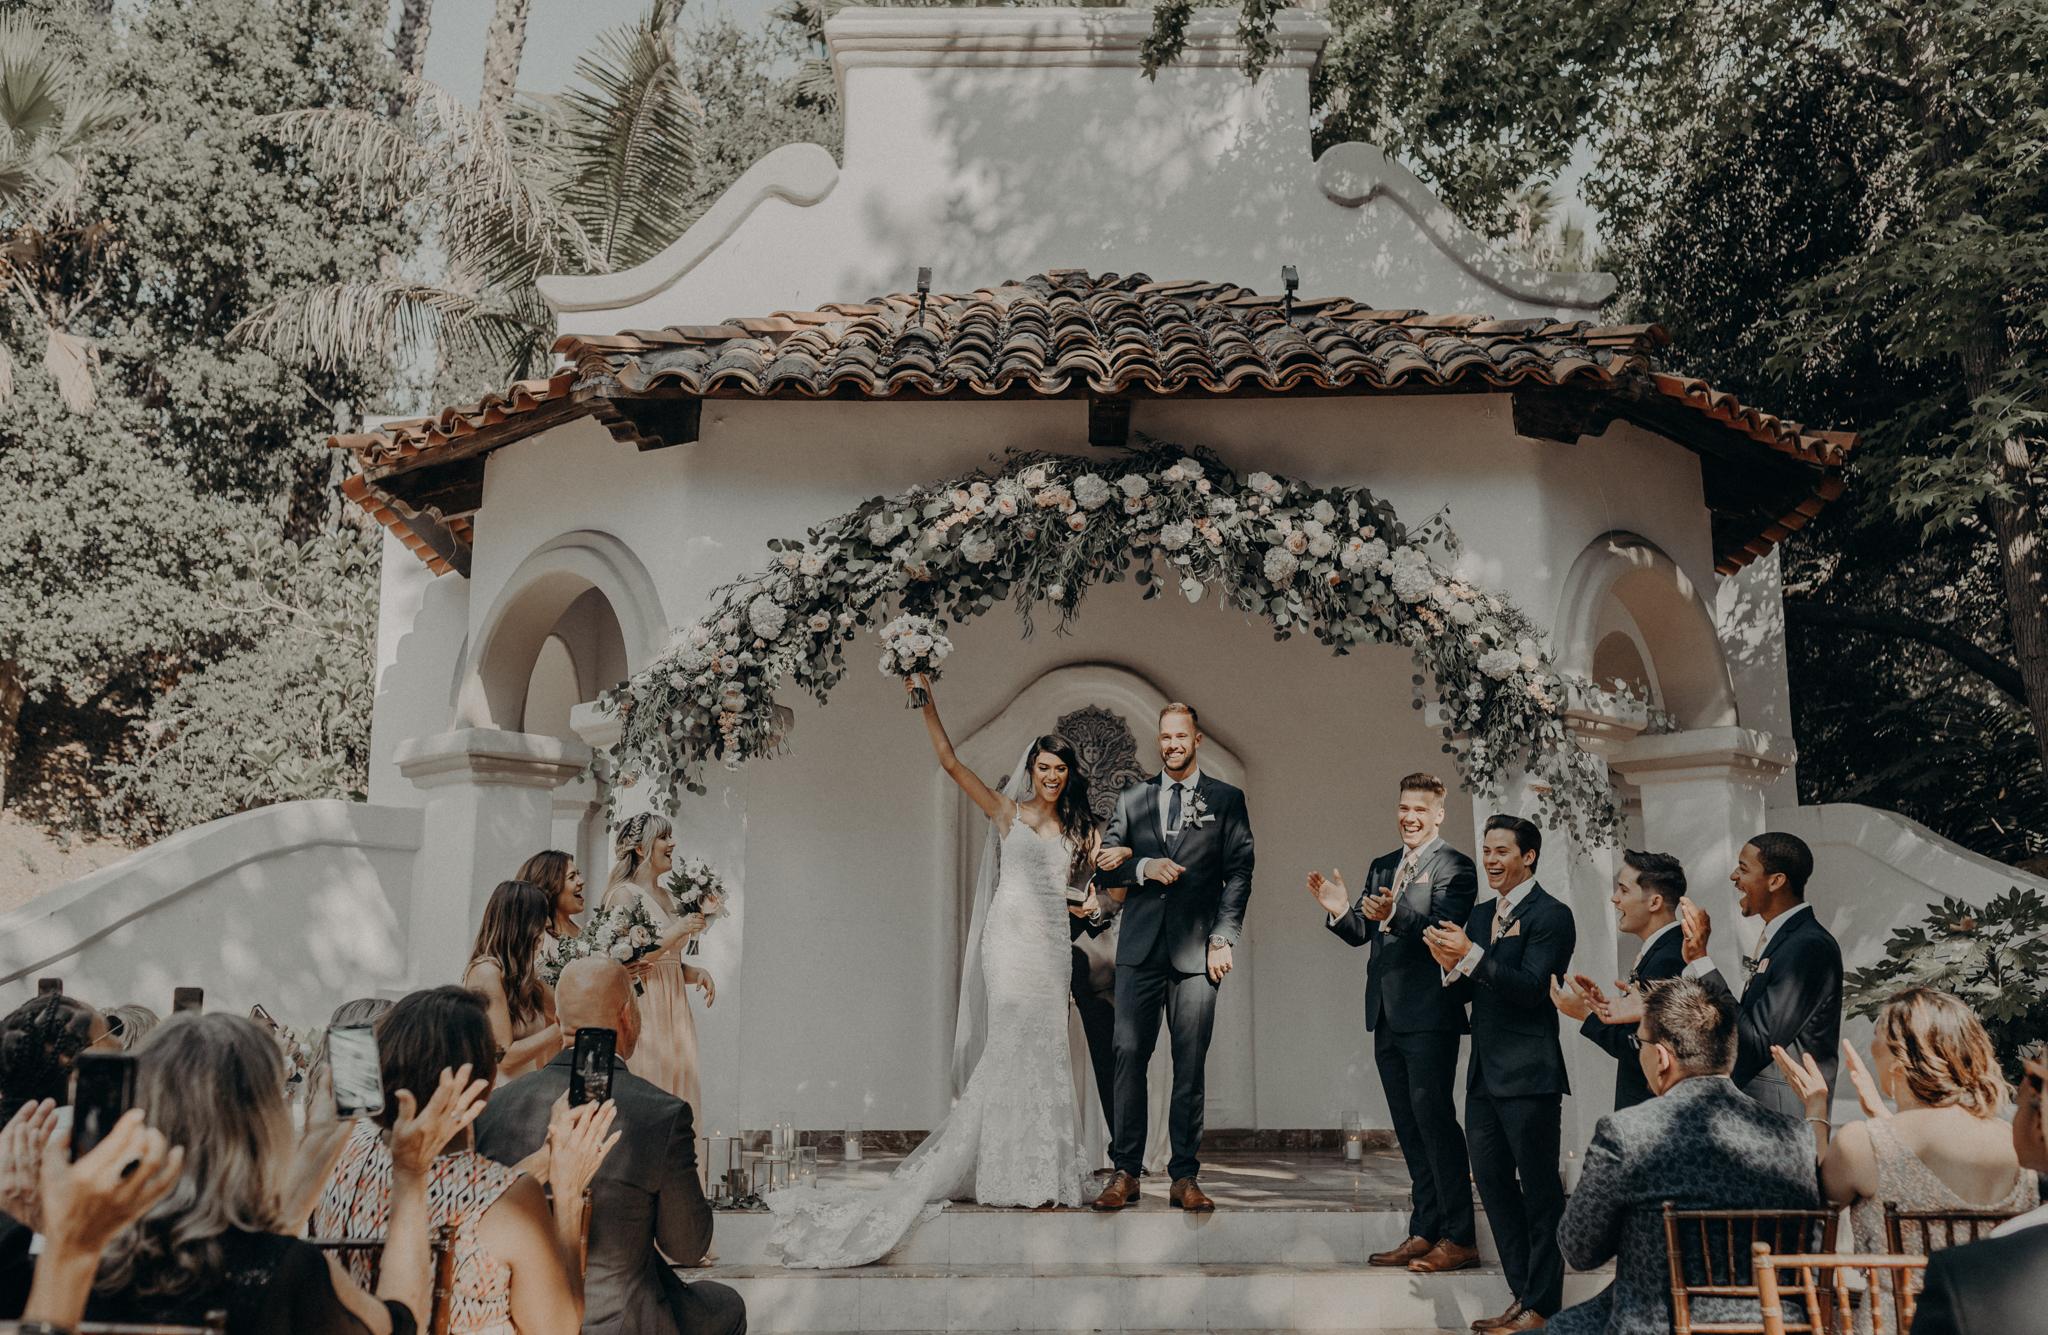 Isaiah + Taylor Photography - Rancho Las Lomas Wedding, Los Angeles Wedding Photographer-065.jpg